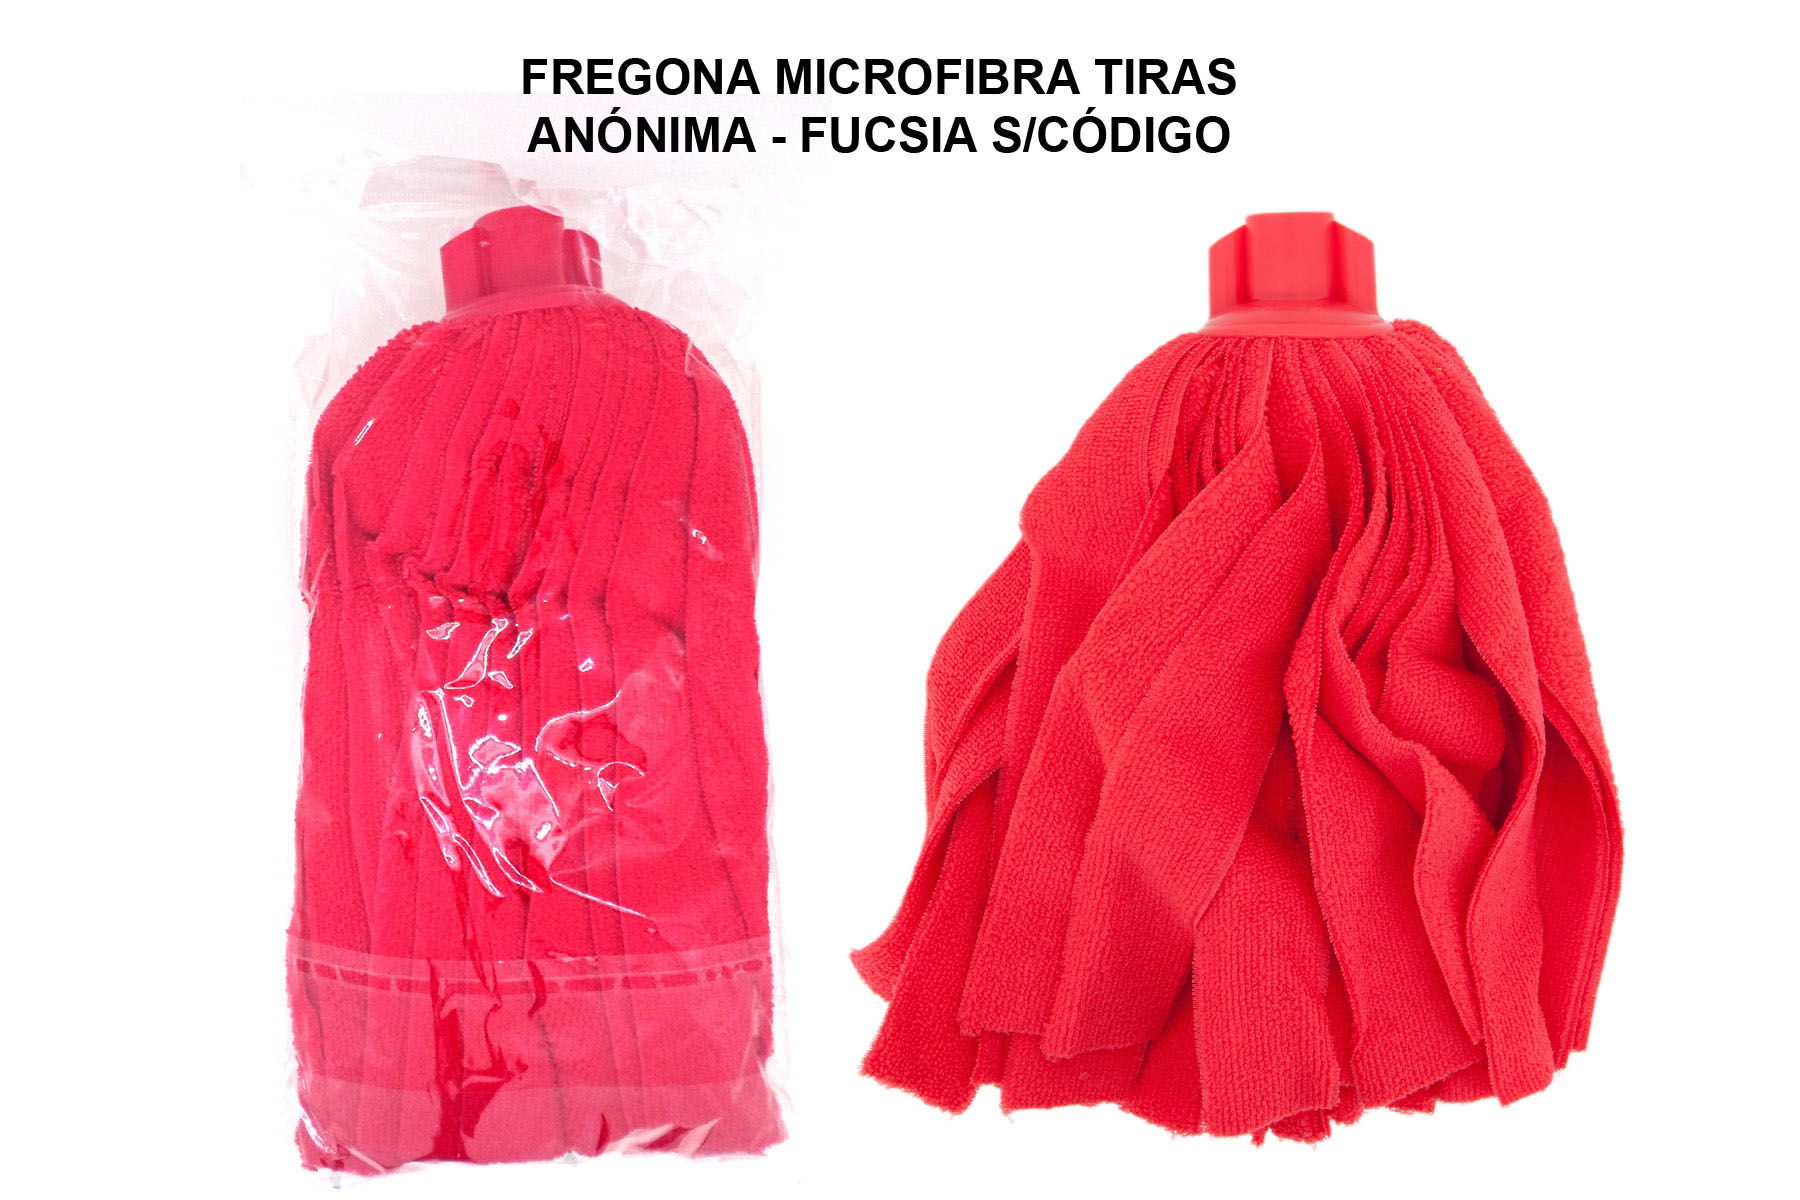 FREGONA MICROFIBRA TIRAS ANONIMA - FUCSIA S/CODIGO